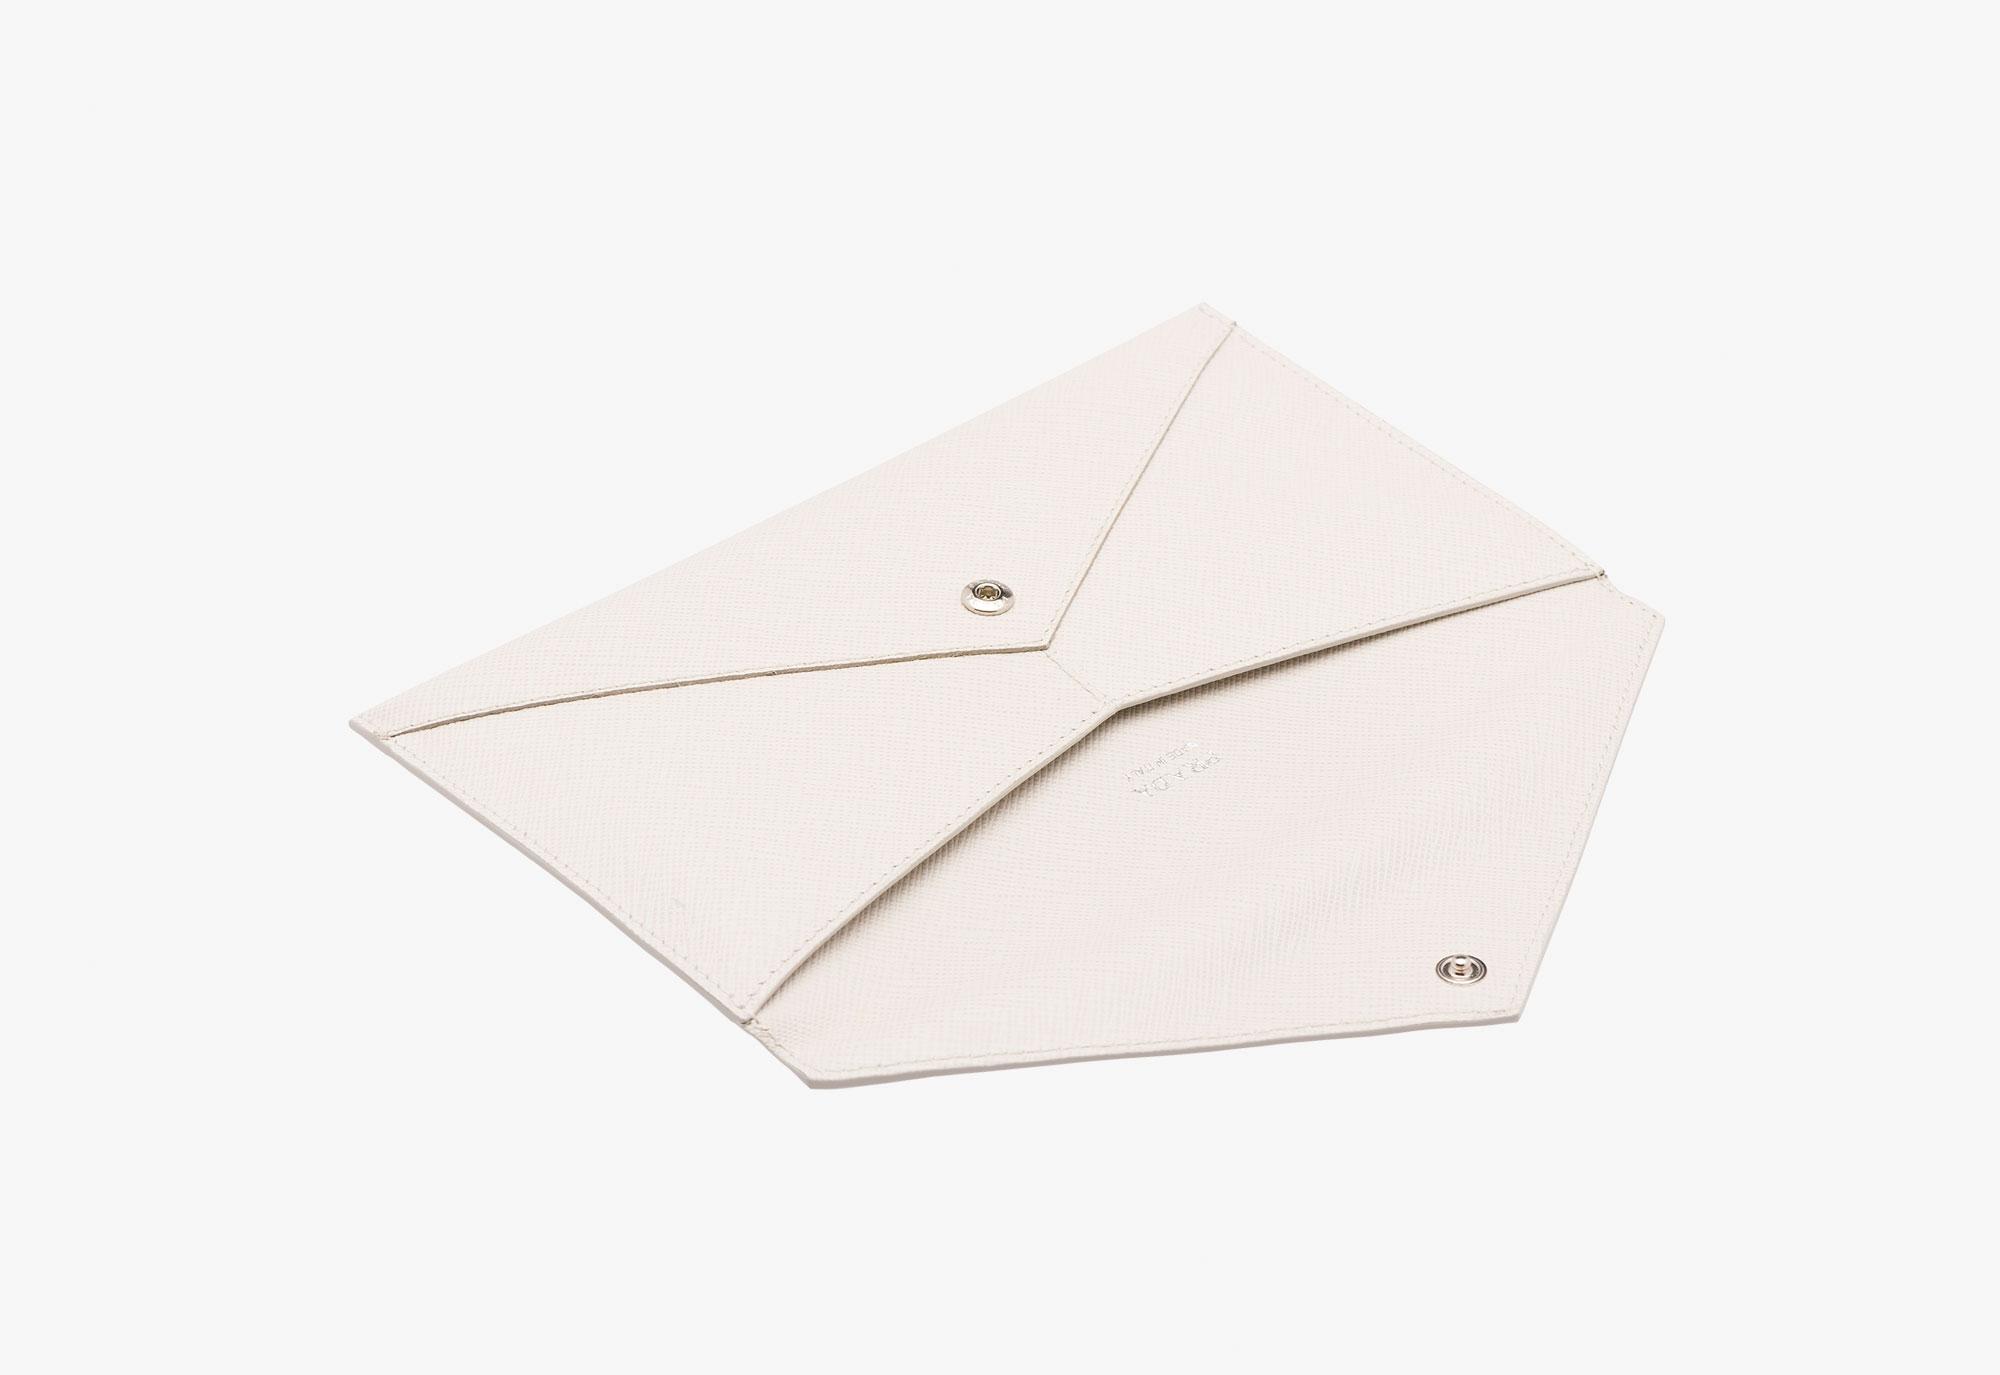 prada wallet chalk white